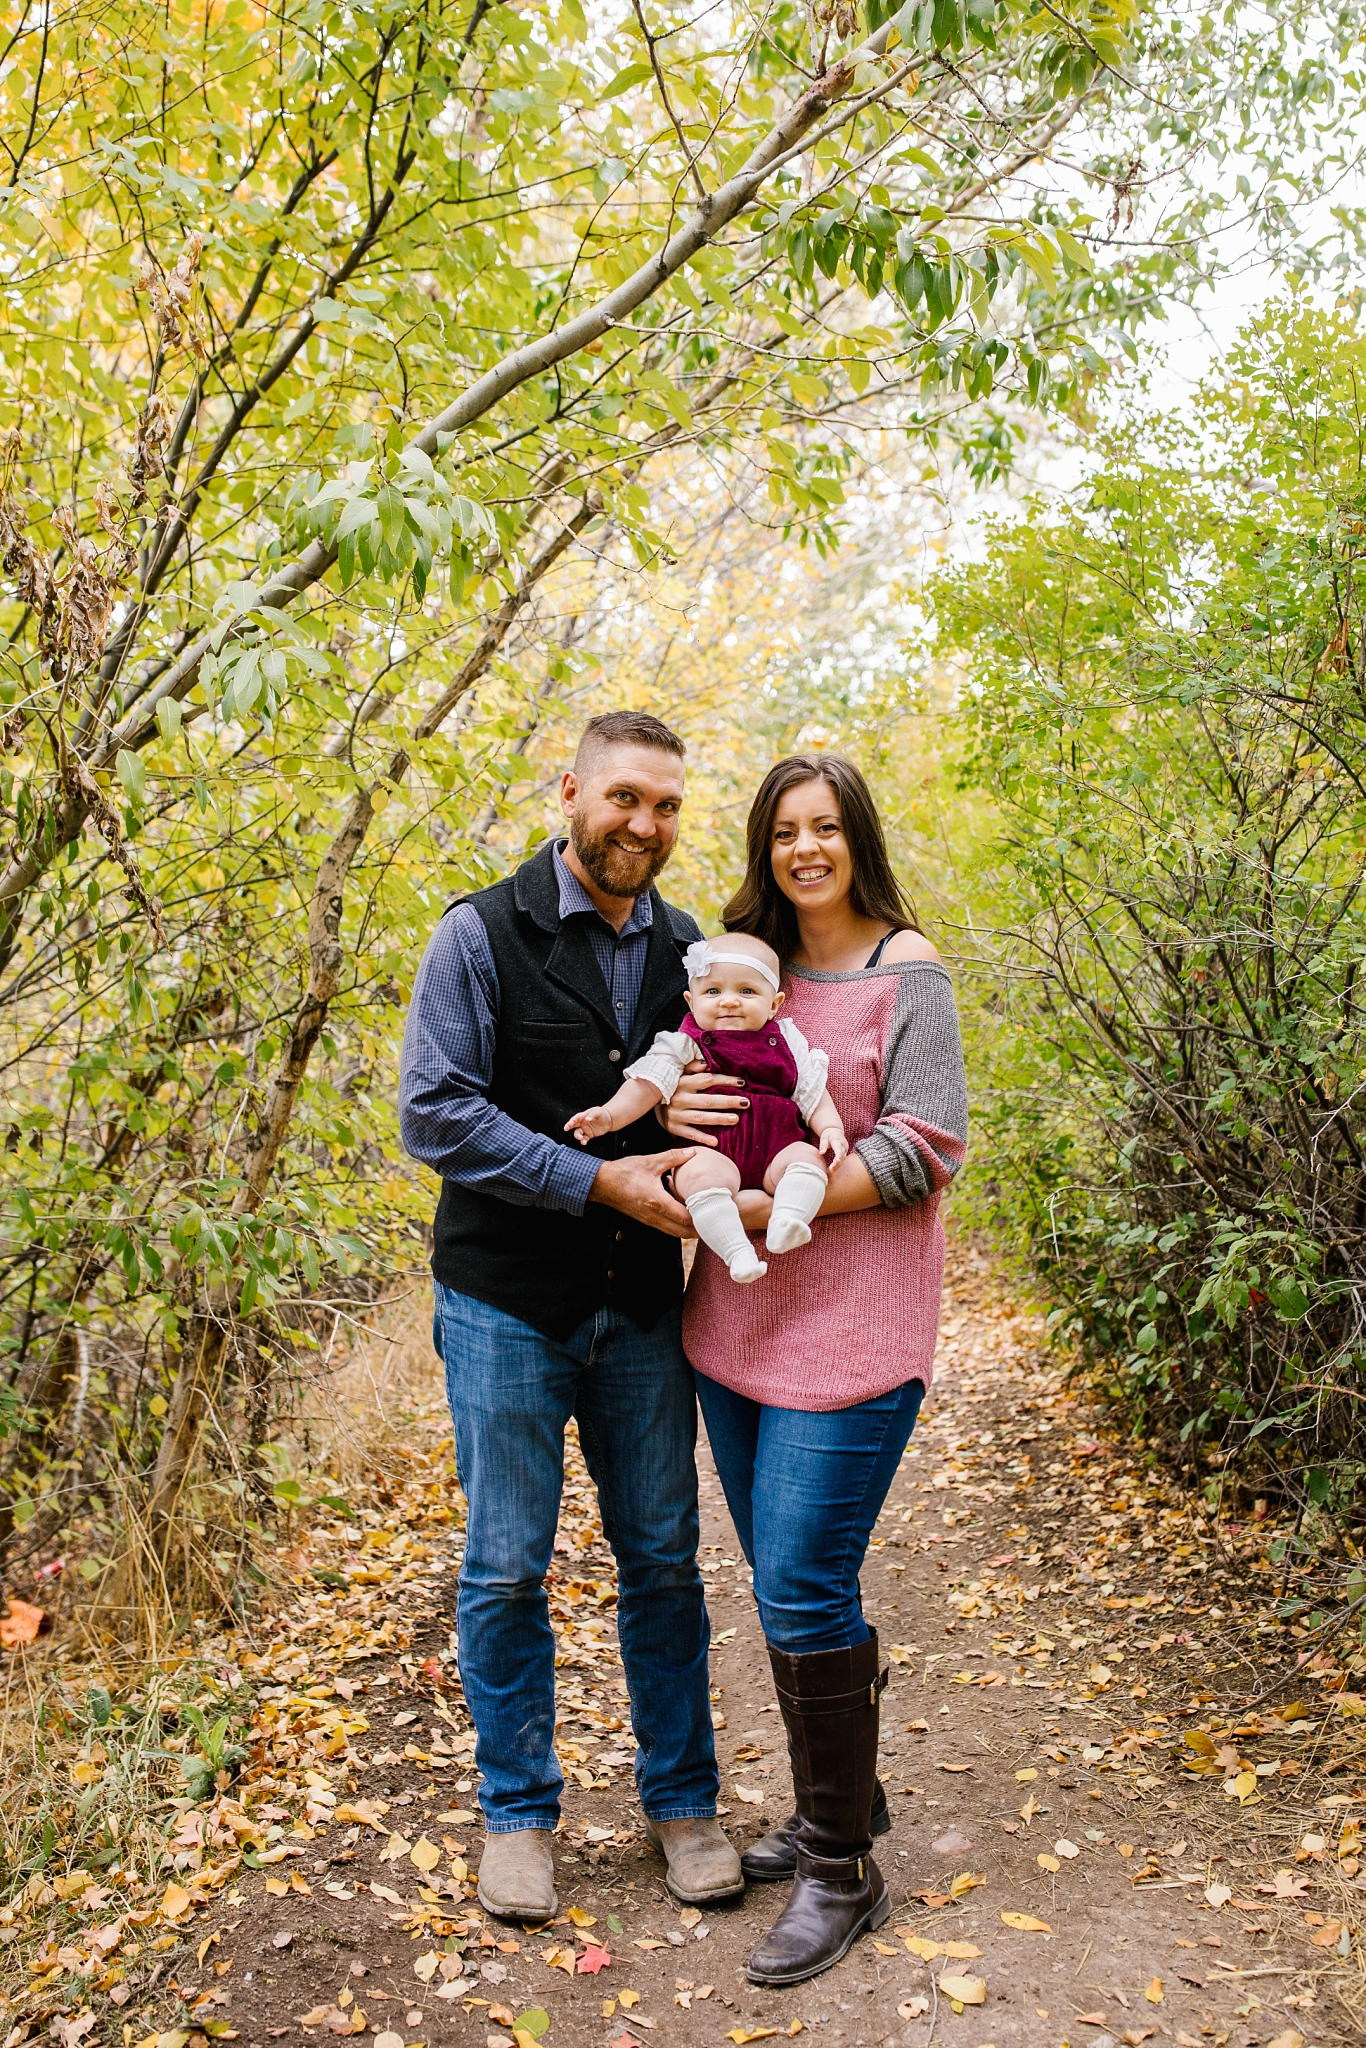 Matthews-19_Lizzie-B-Imagery-Utah-Family-Photographer-Park-City-Salt-Lake-City-Nephi-Utah.jpg